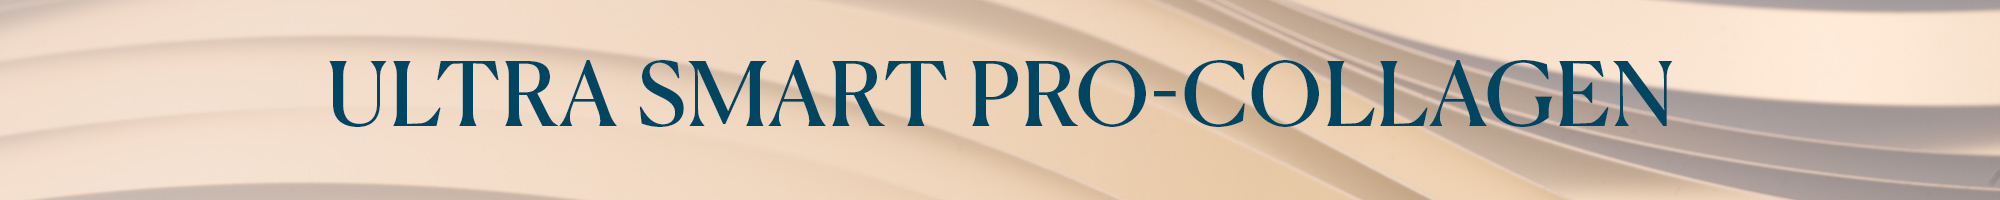 Ultra Smart Pro-Collagen